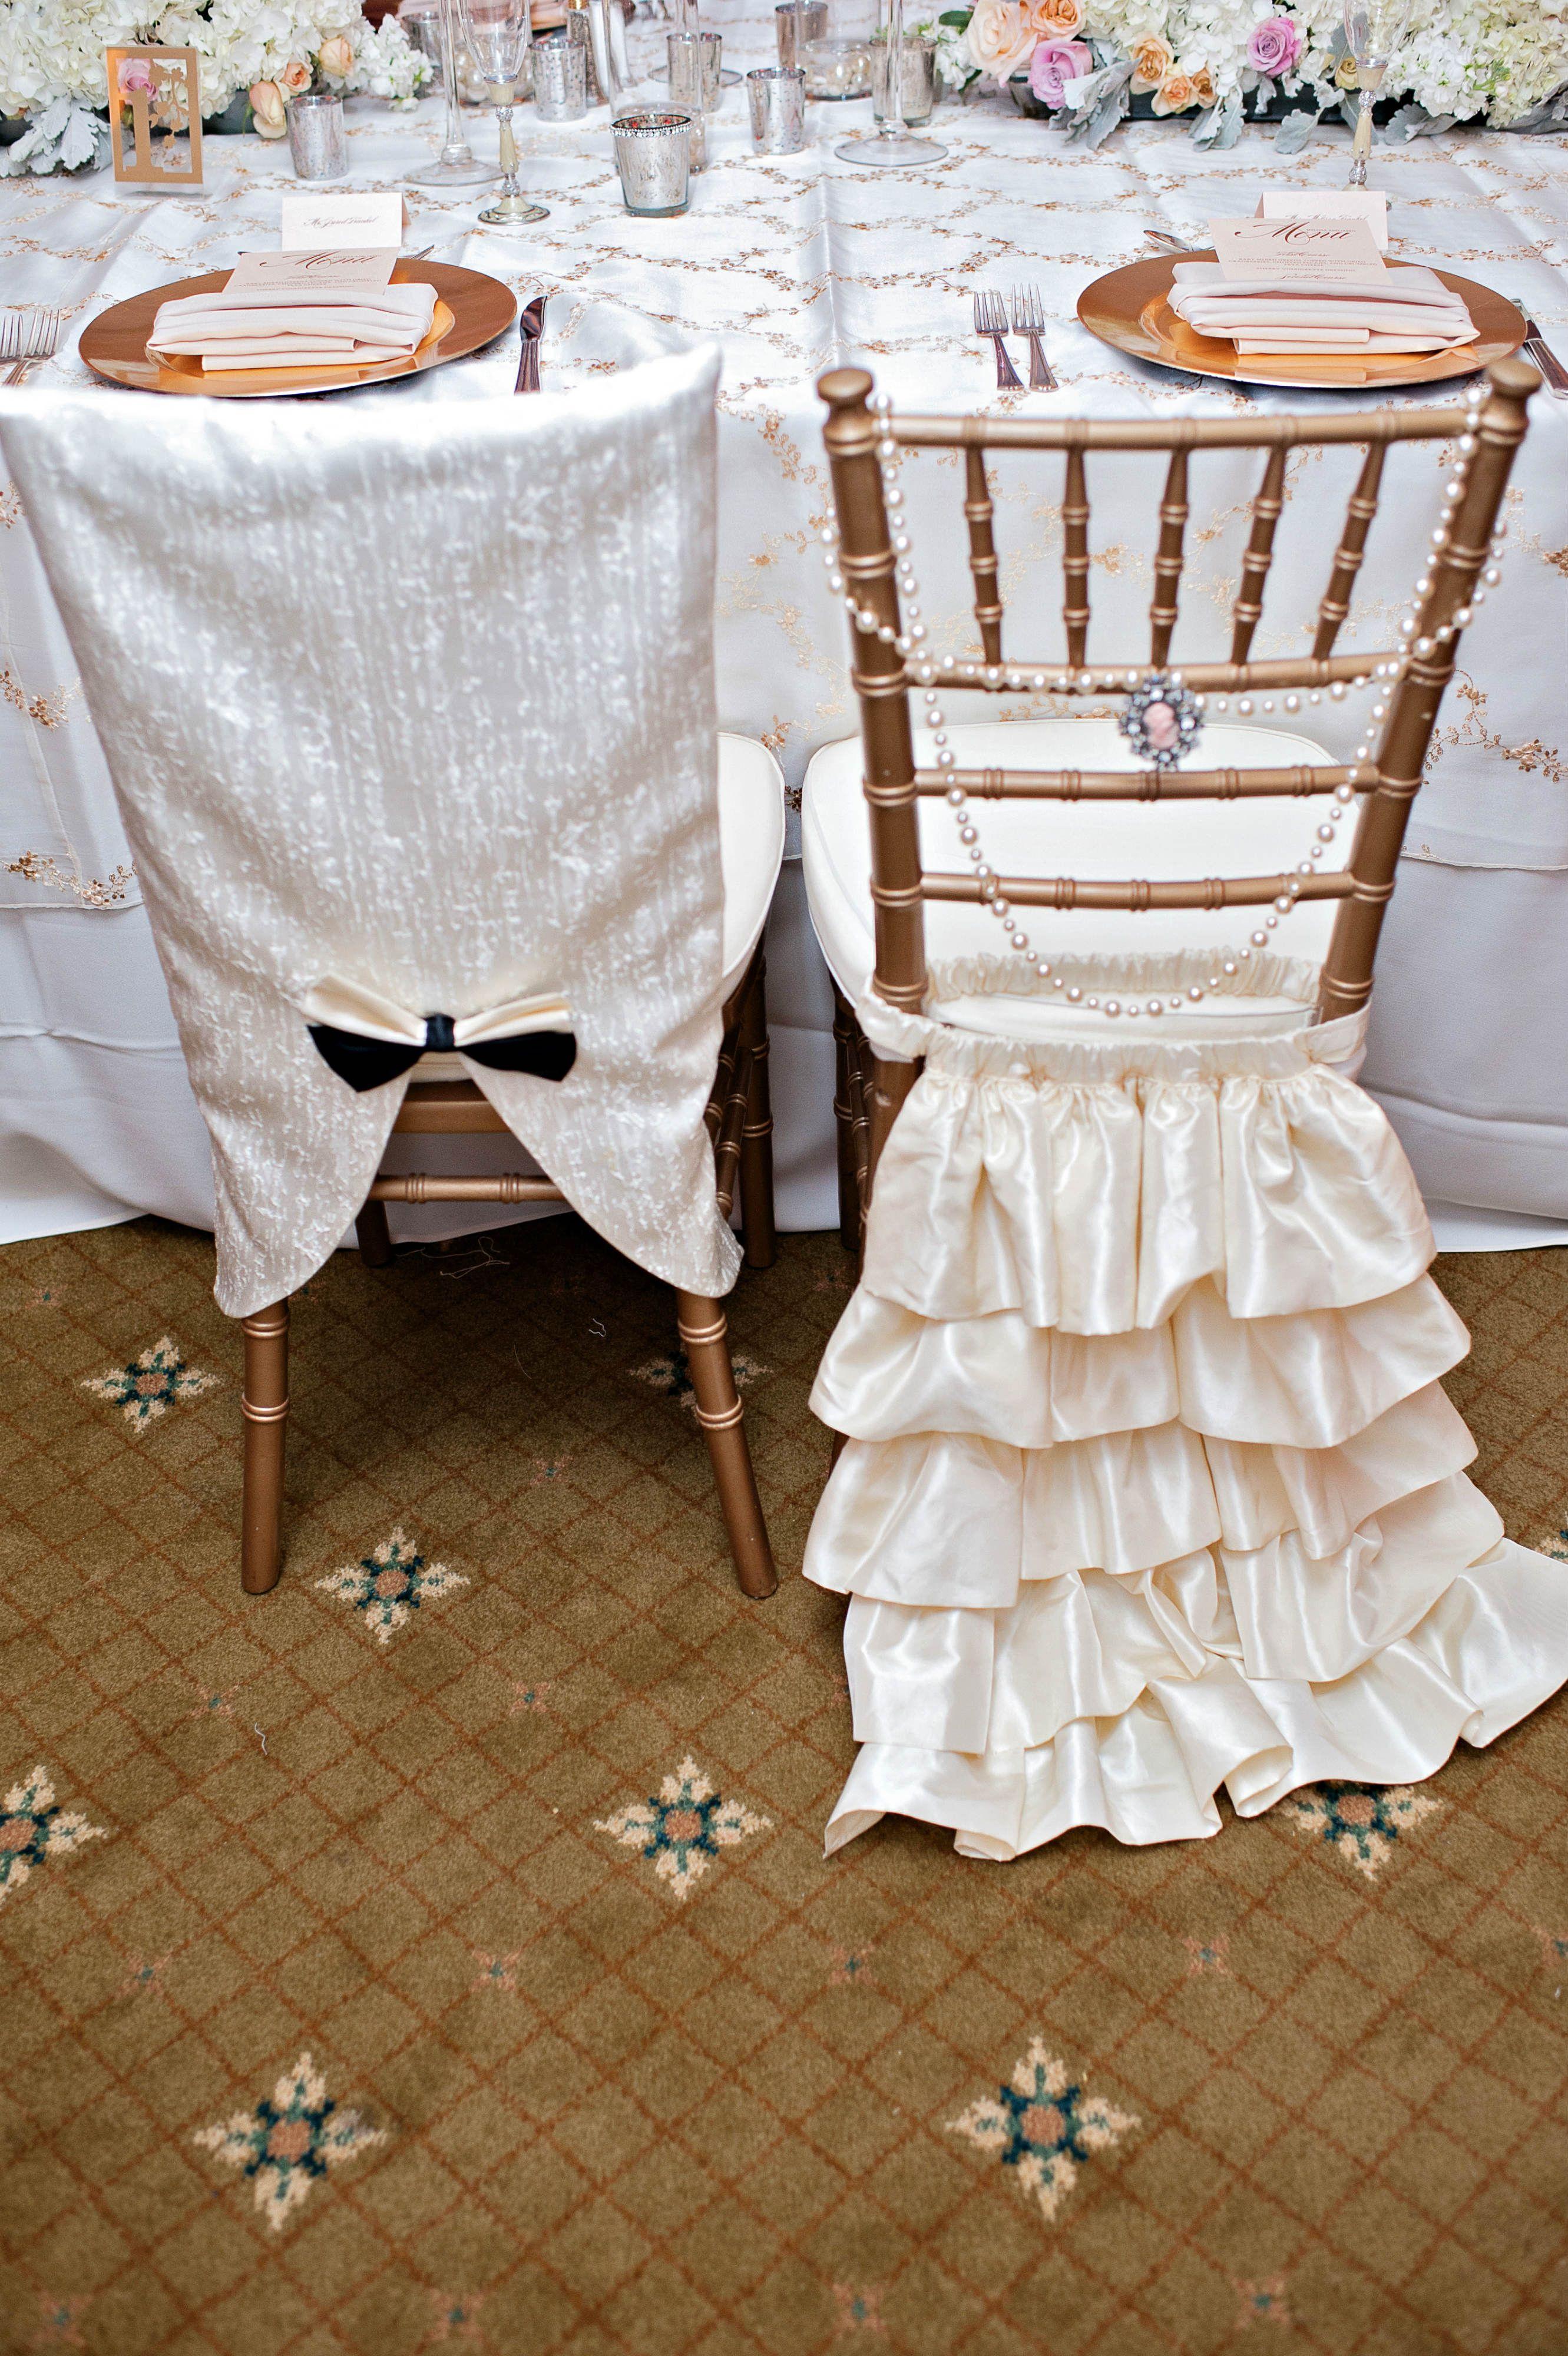 chivari chair covers super cute bride and groom idea